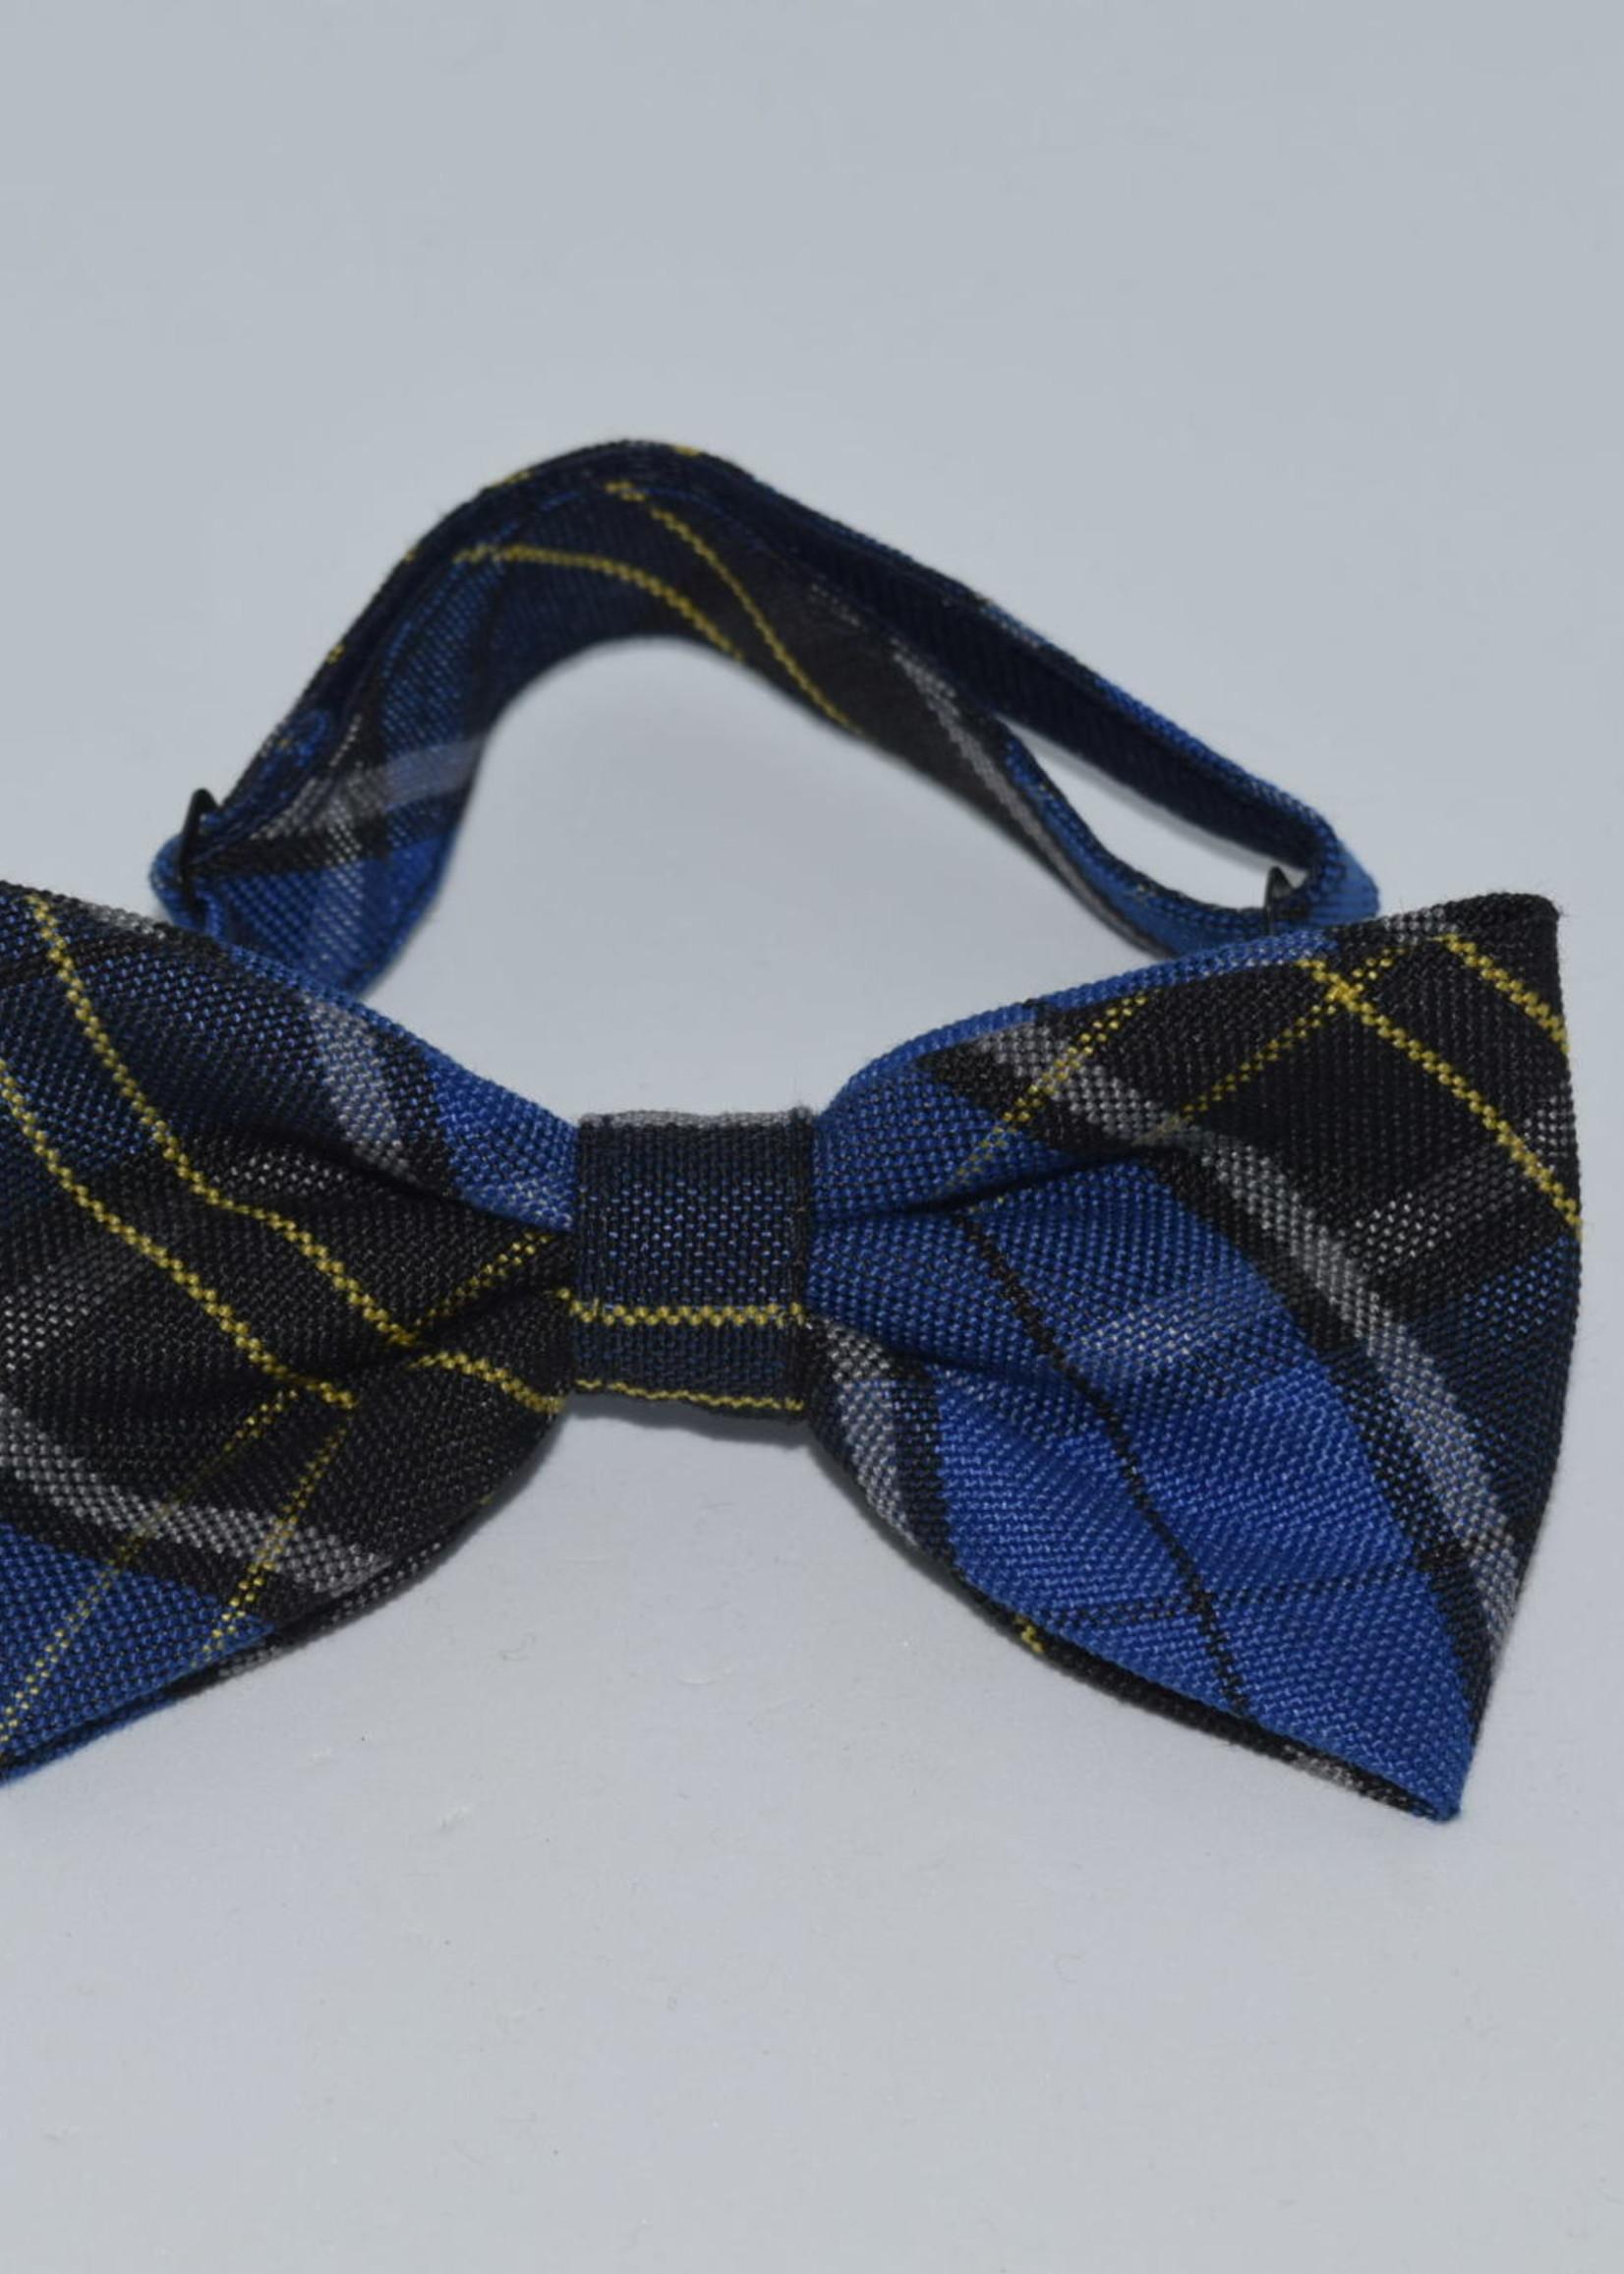 EDT Plaid Bow Tie w/adjustable neck strap P92